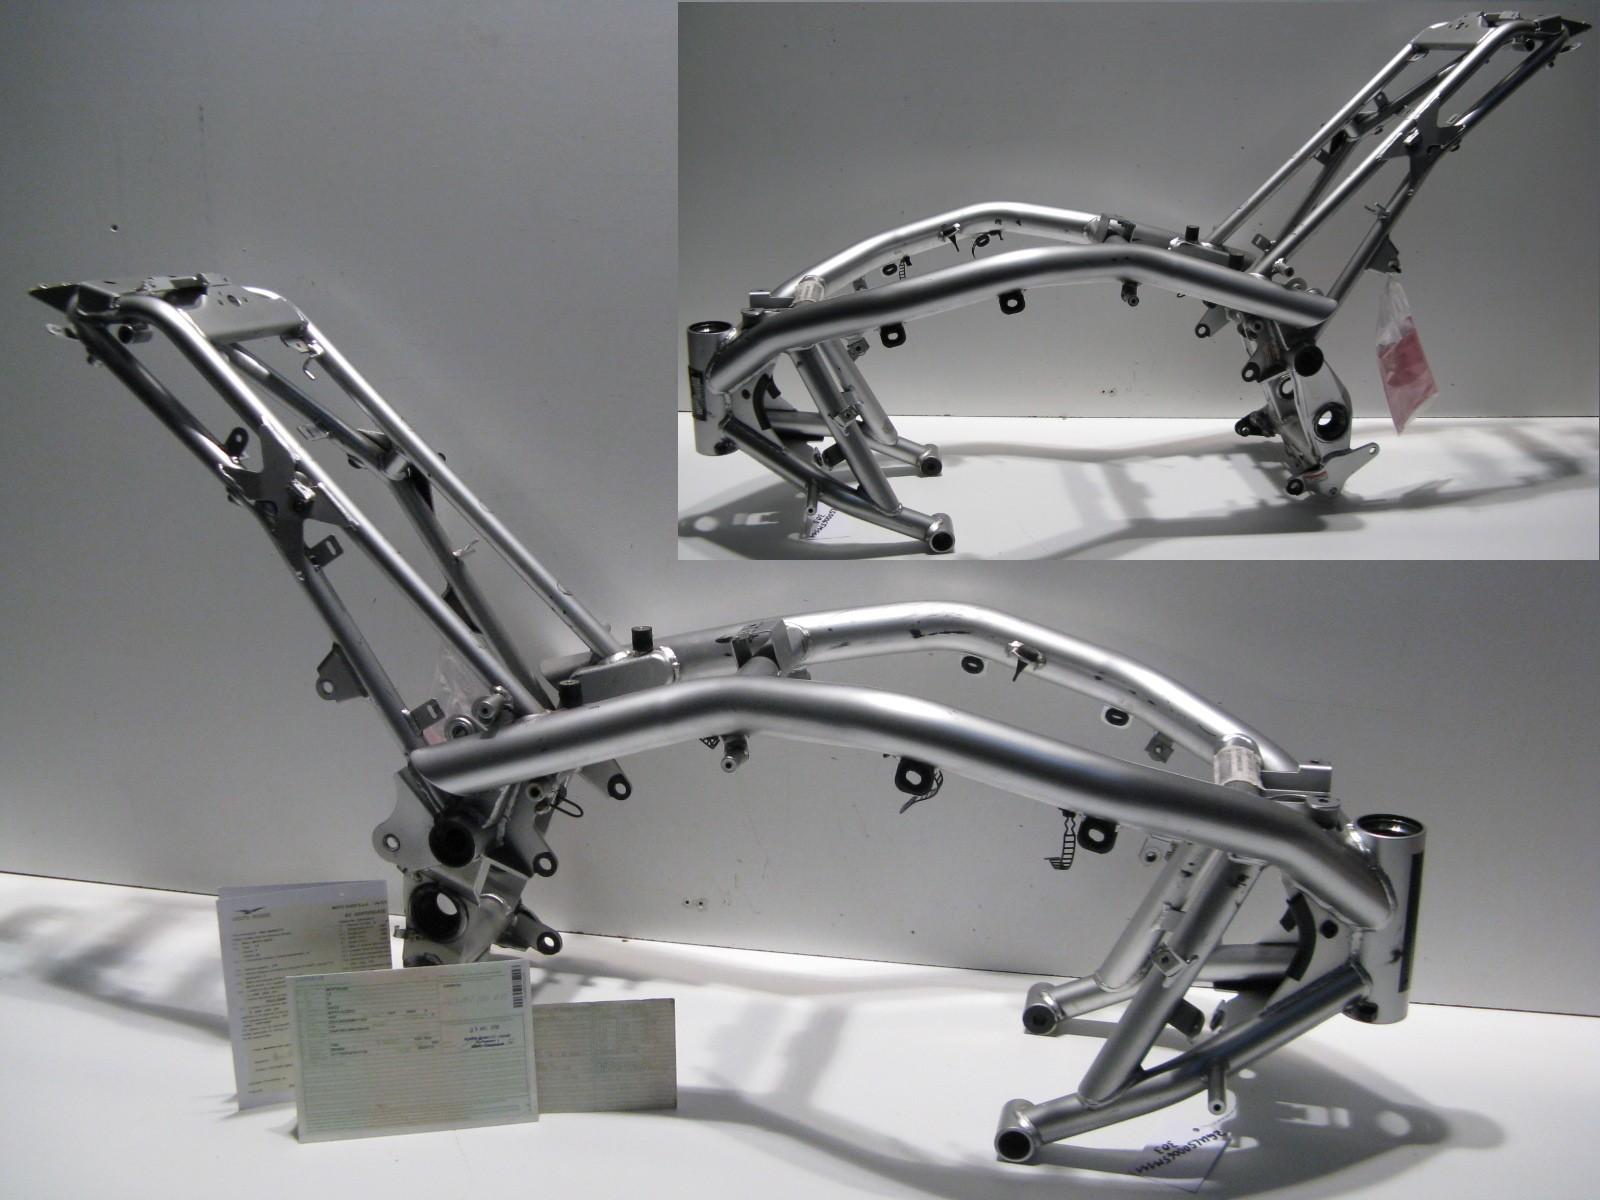 Moto Guzzi Rahmen Mit Brief – Motorrad Bild Idee